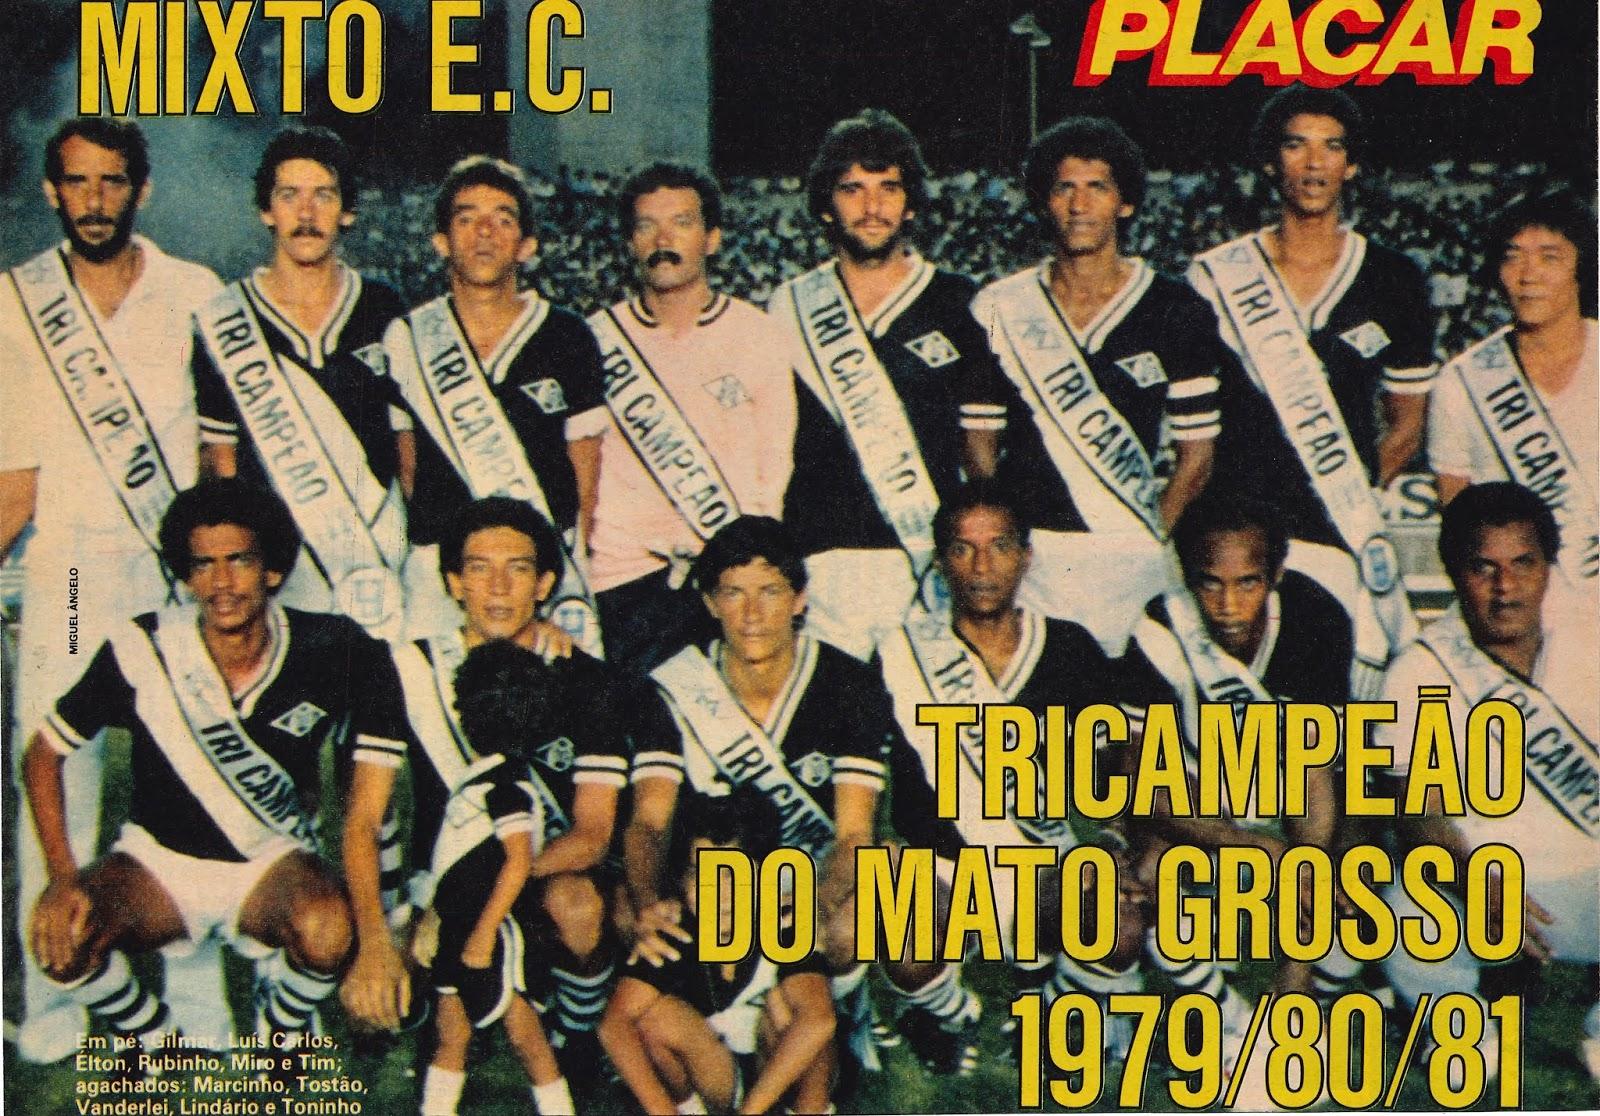 Elton, Gilmar, Miro, Tim, Luiz Carlos Beleza, Valter, Gonçalves, Tostão, Vanderlei, Marcinho e Toninho Campos.